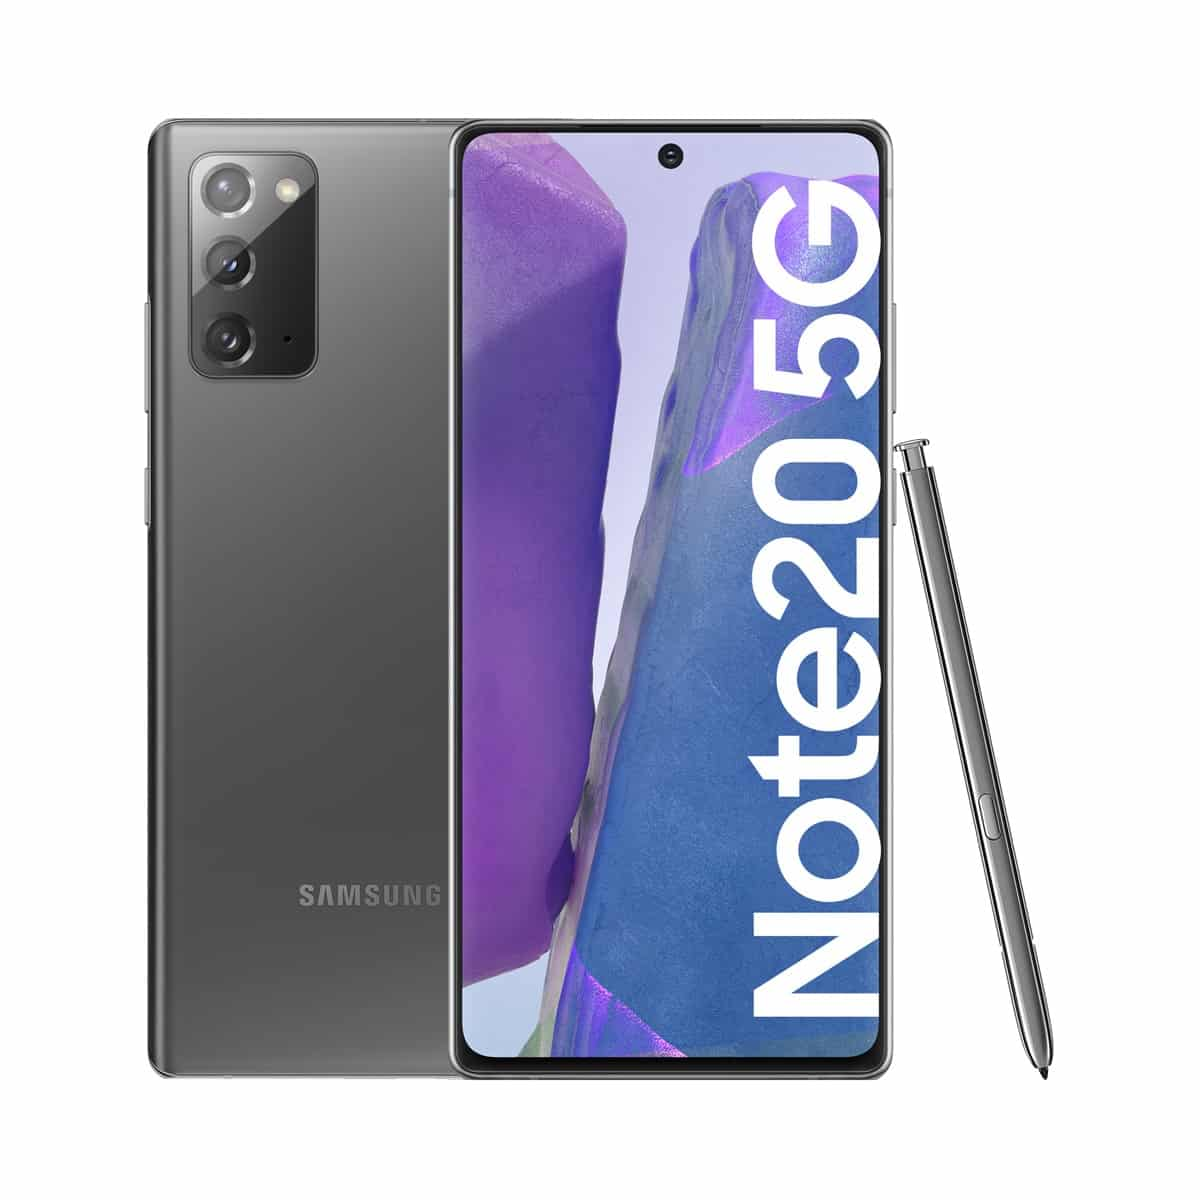 Samsung Galaxy Note20 5G, 8 GB + 256 GB Mystic Gray móvil libre